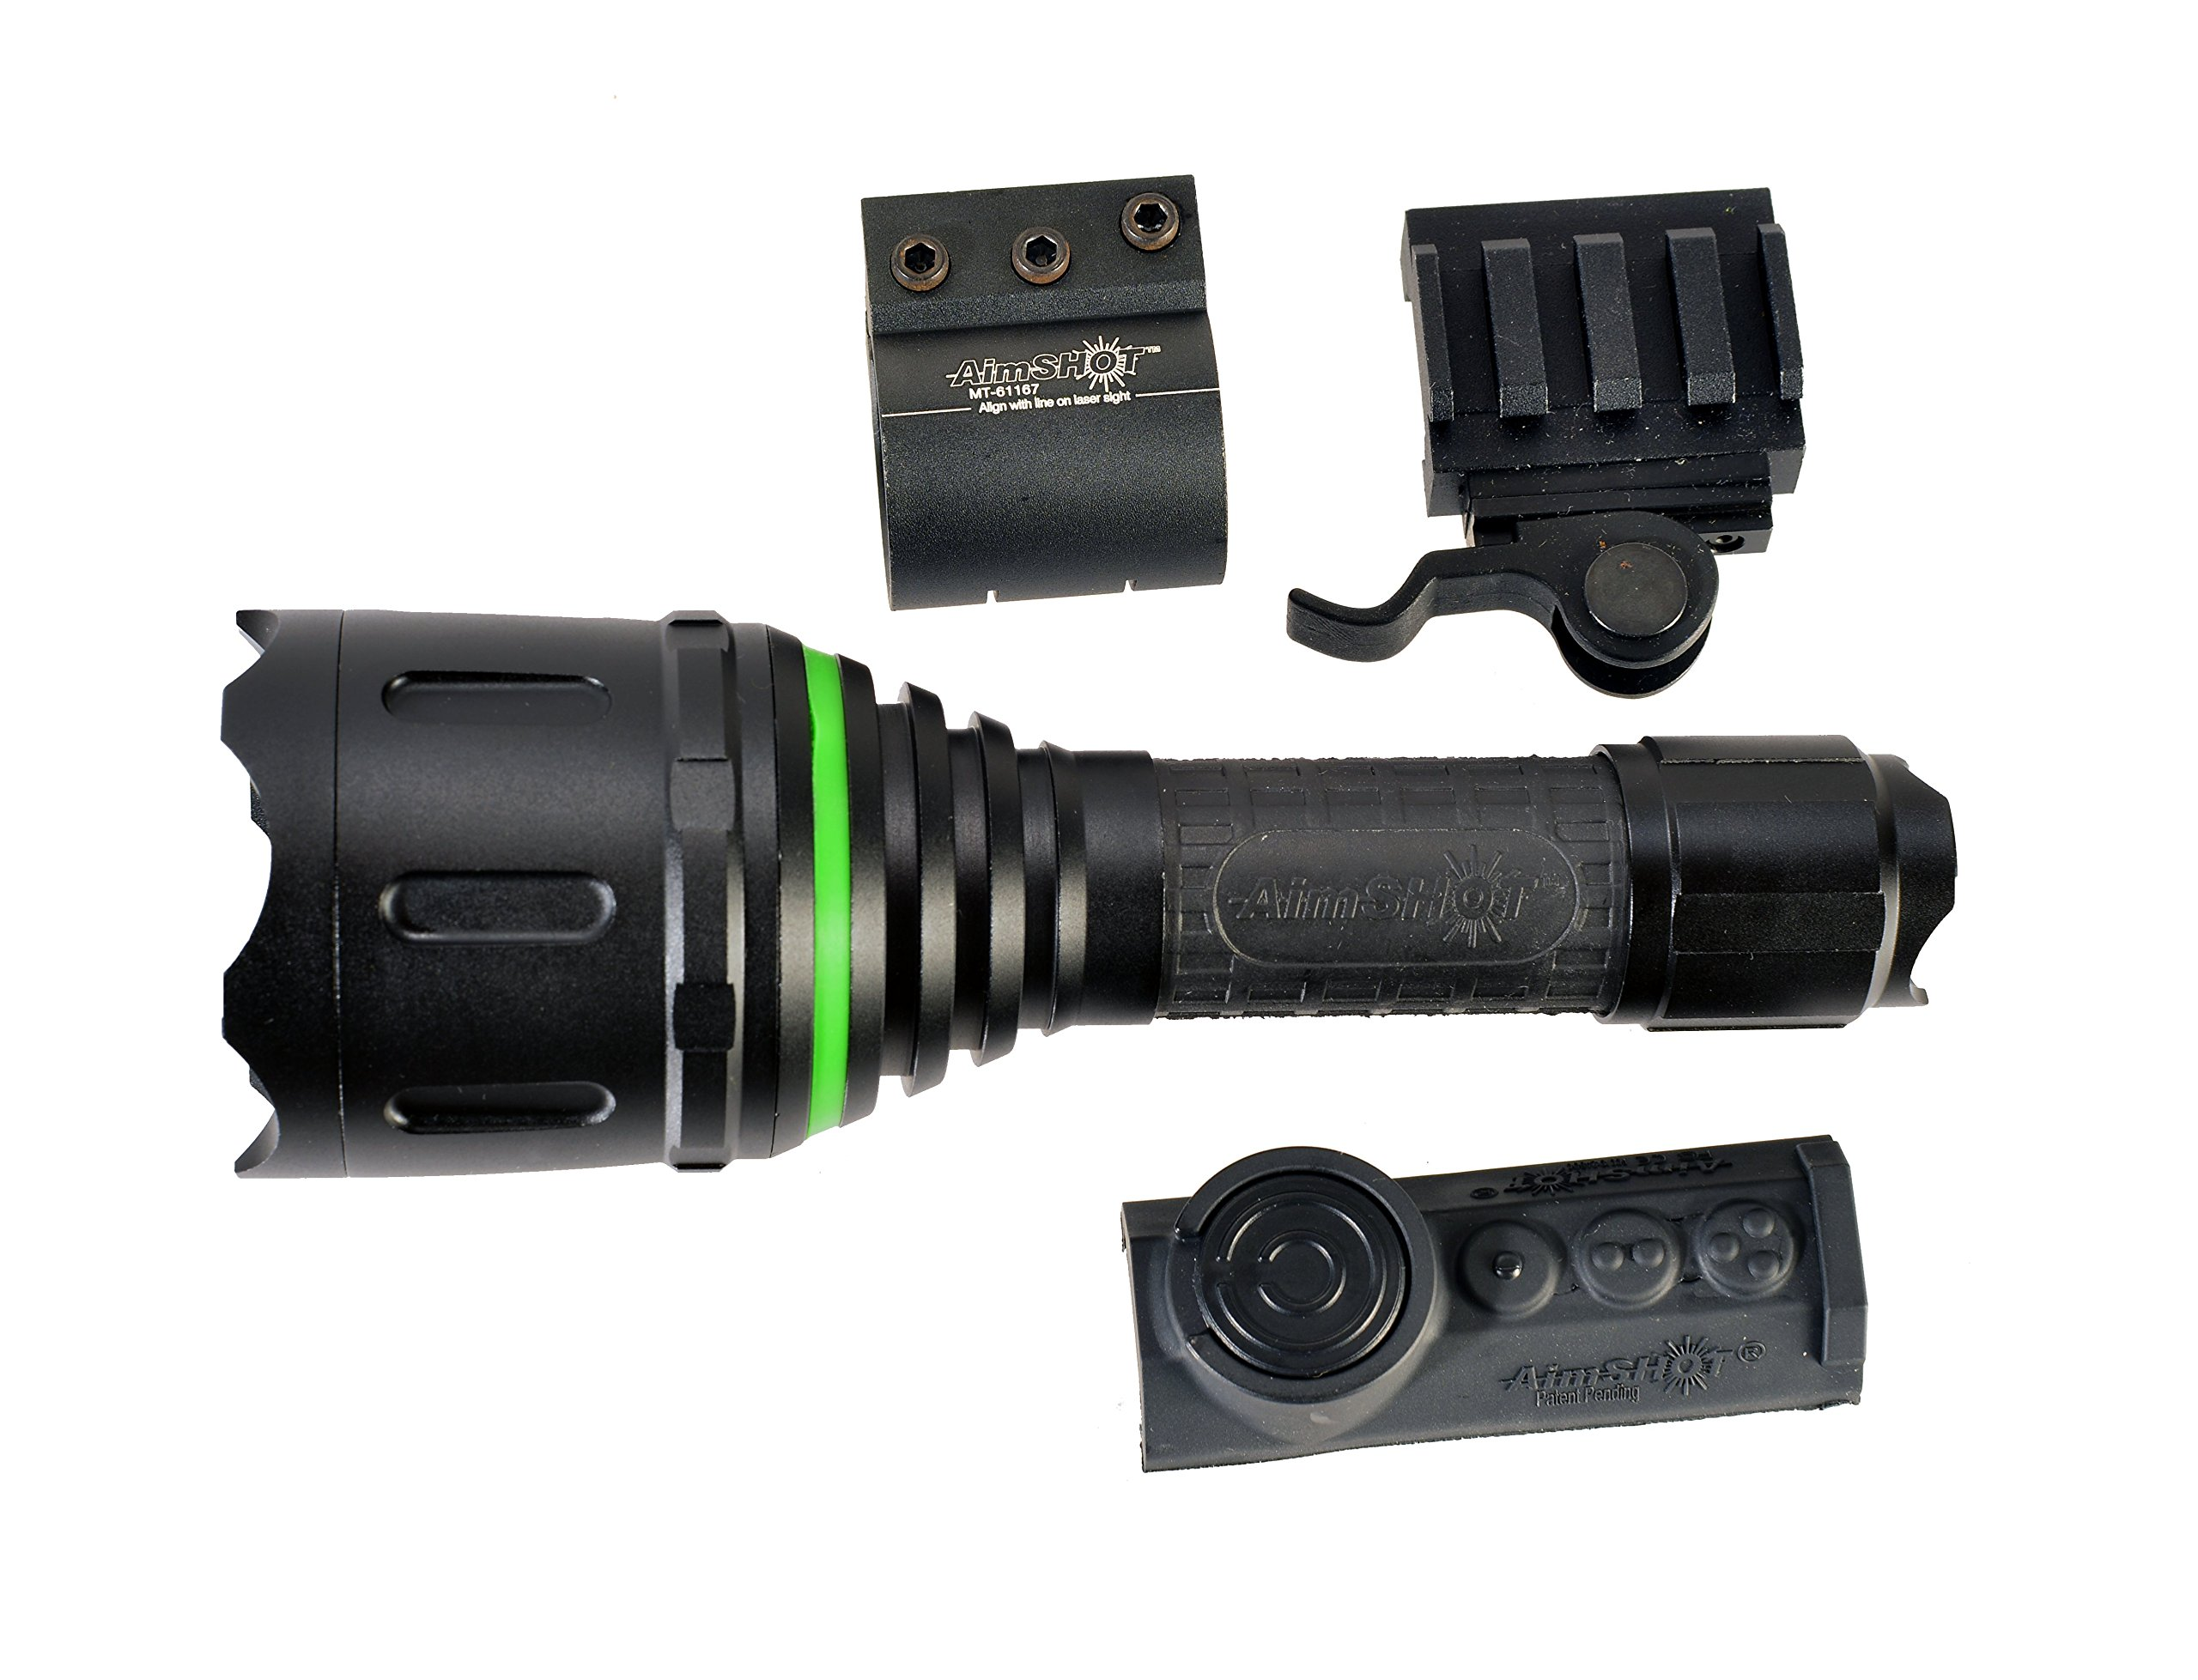 Aimshot TZ980-GR Adjustable Beam Wireless Green Flashlight Kit, Black